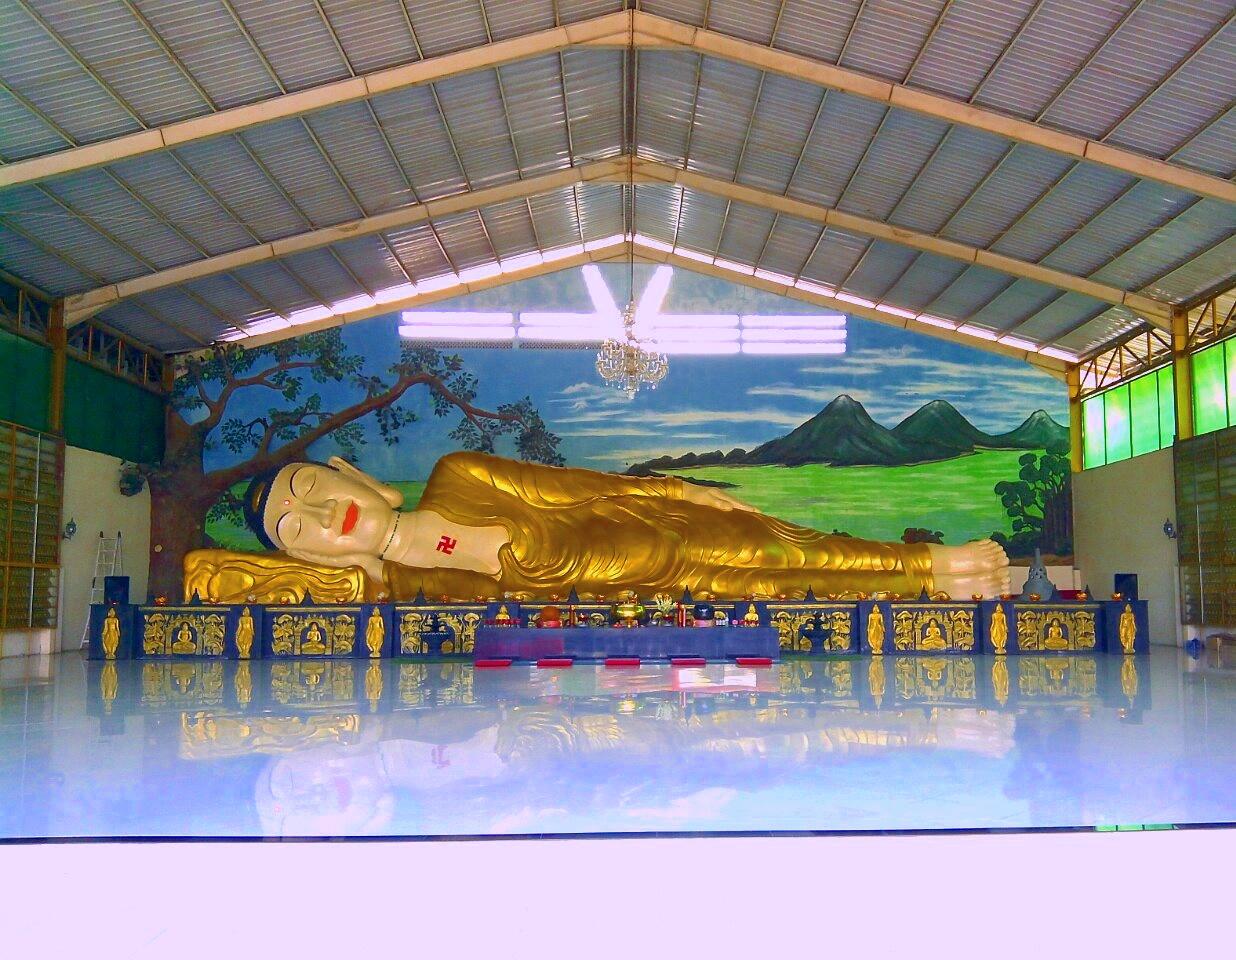 Gallerinya Photography Patung Buddha Tidur Beralamat Desa Kampung Jati Kelurahan